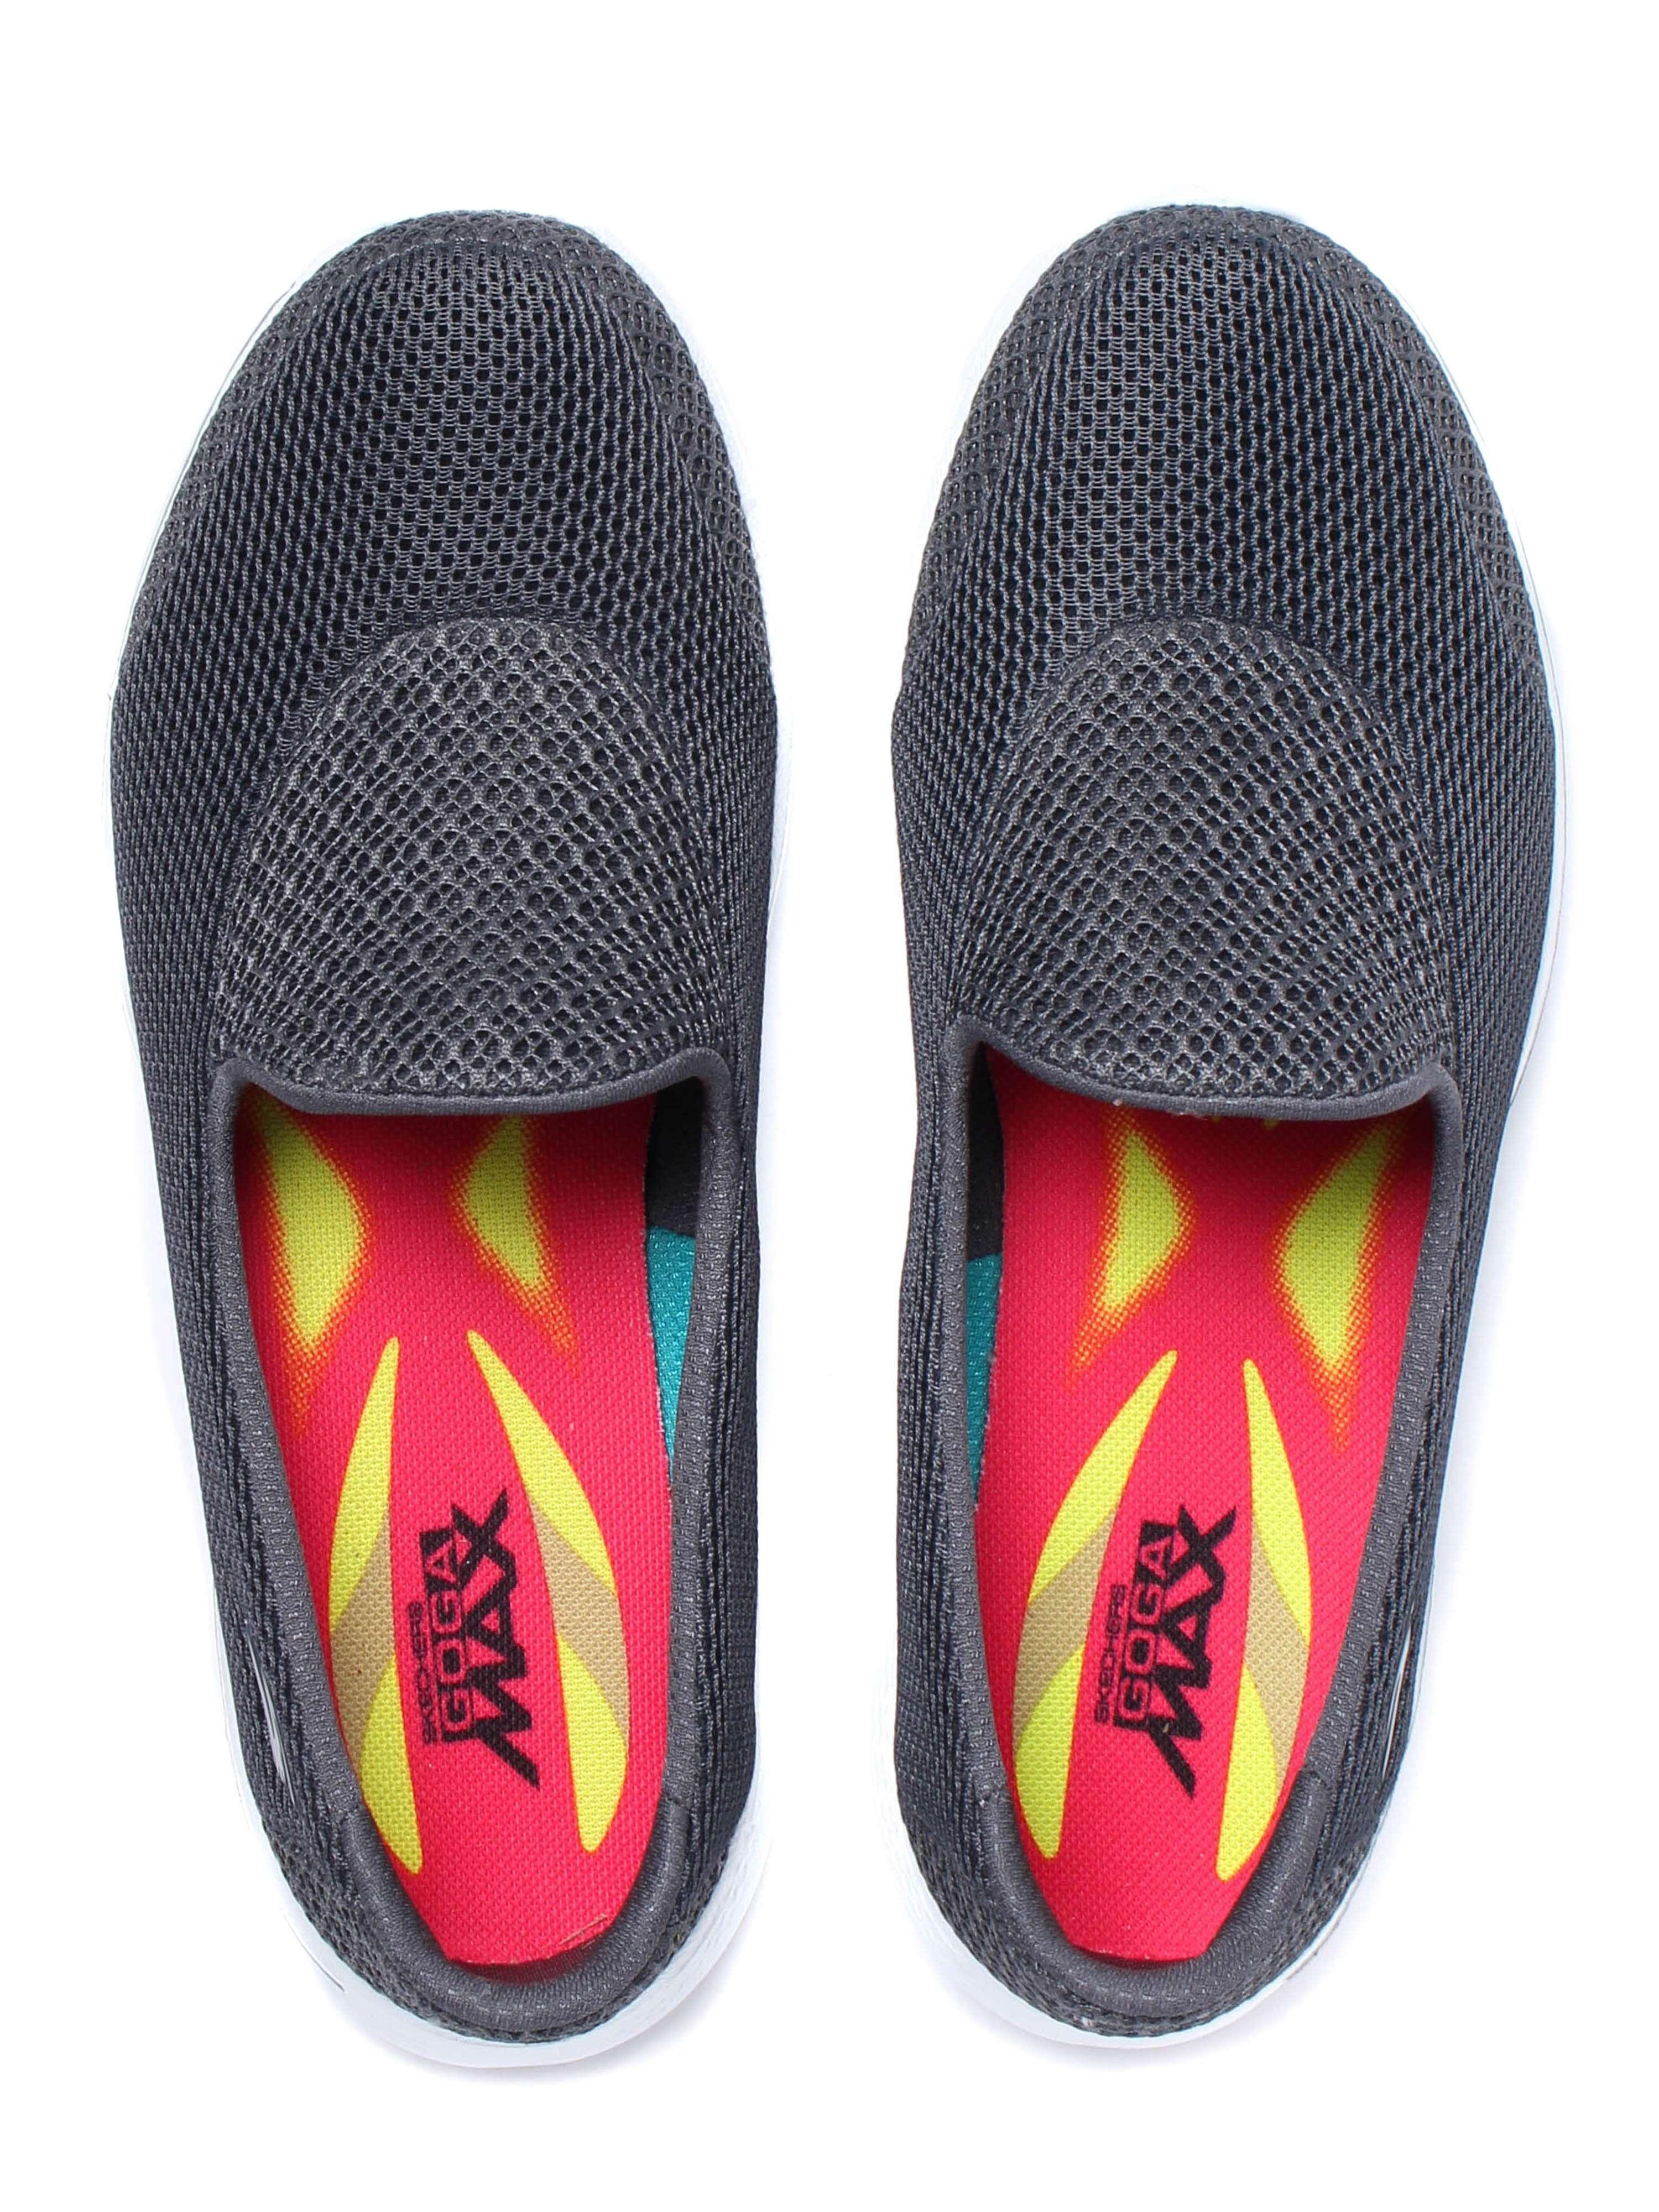 Skechers Skechers Women's Go Walk 4 Propel Trainers - Charcoal